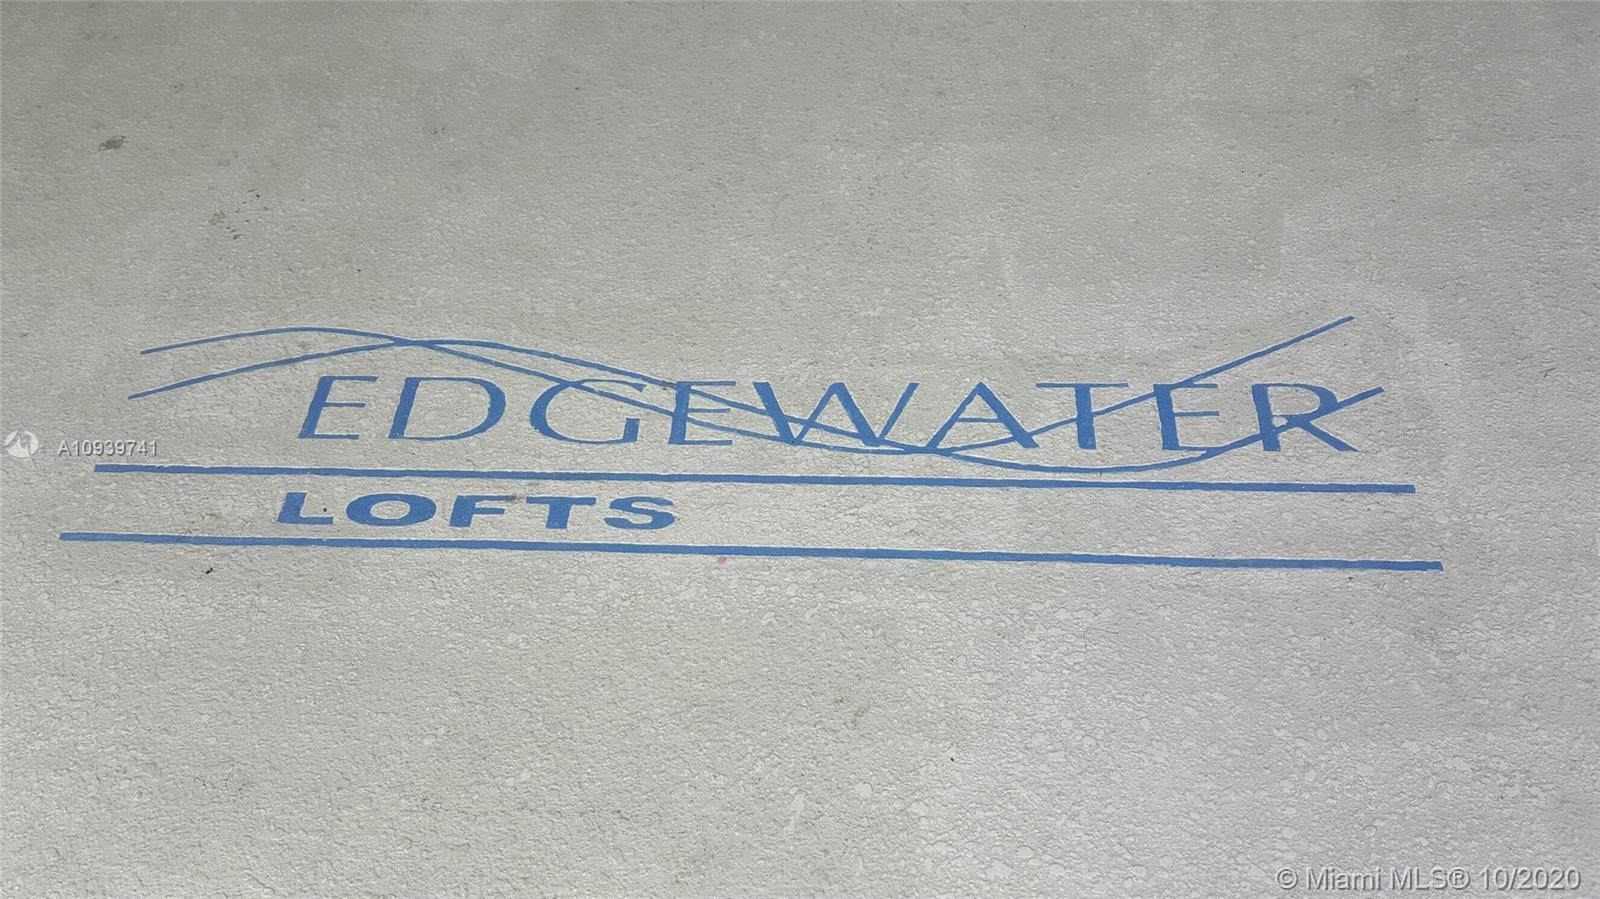 Edgewater Lofts image #9